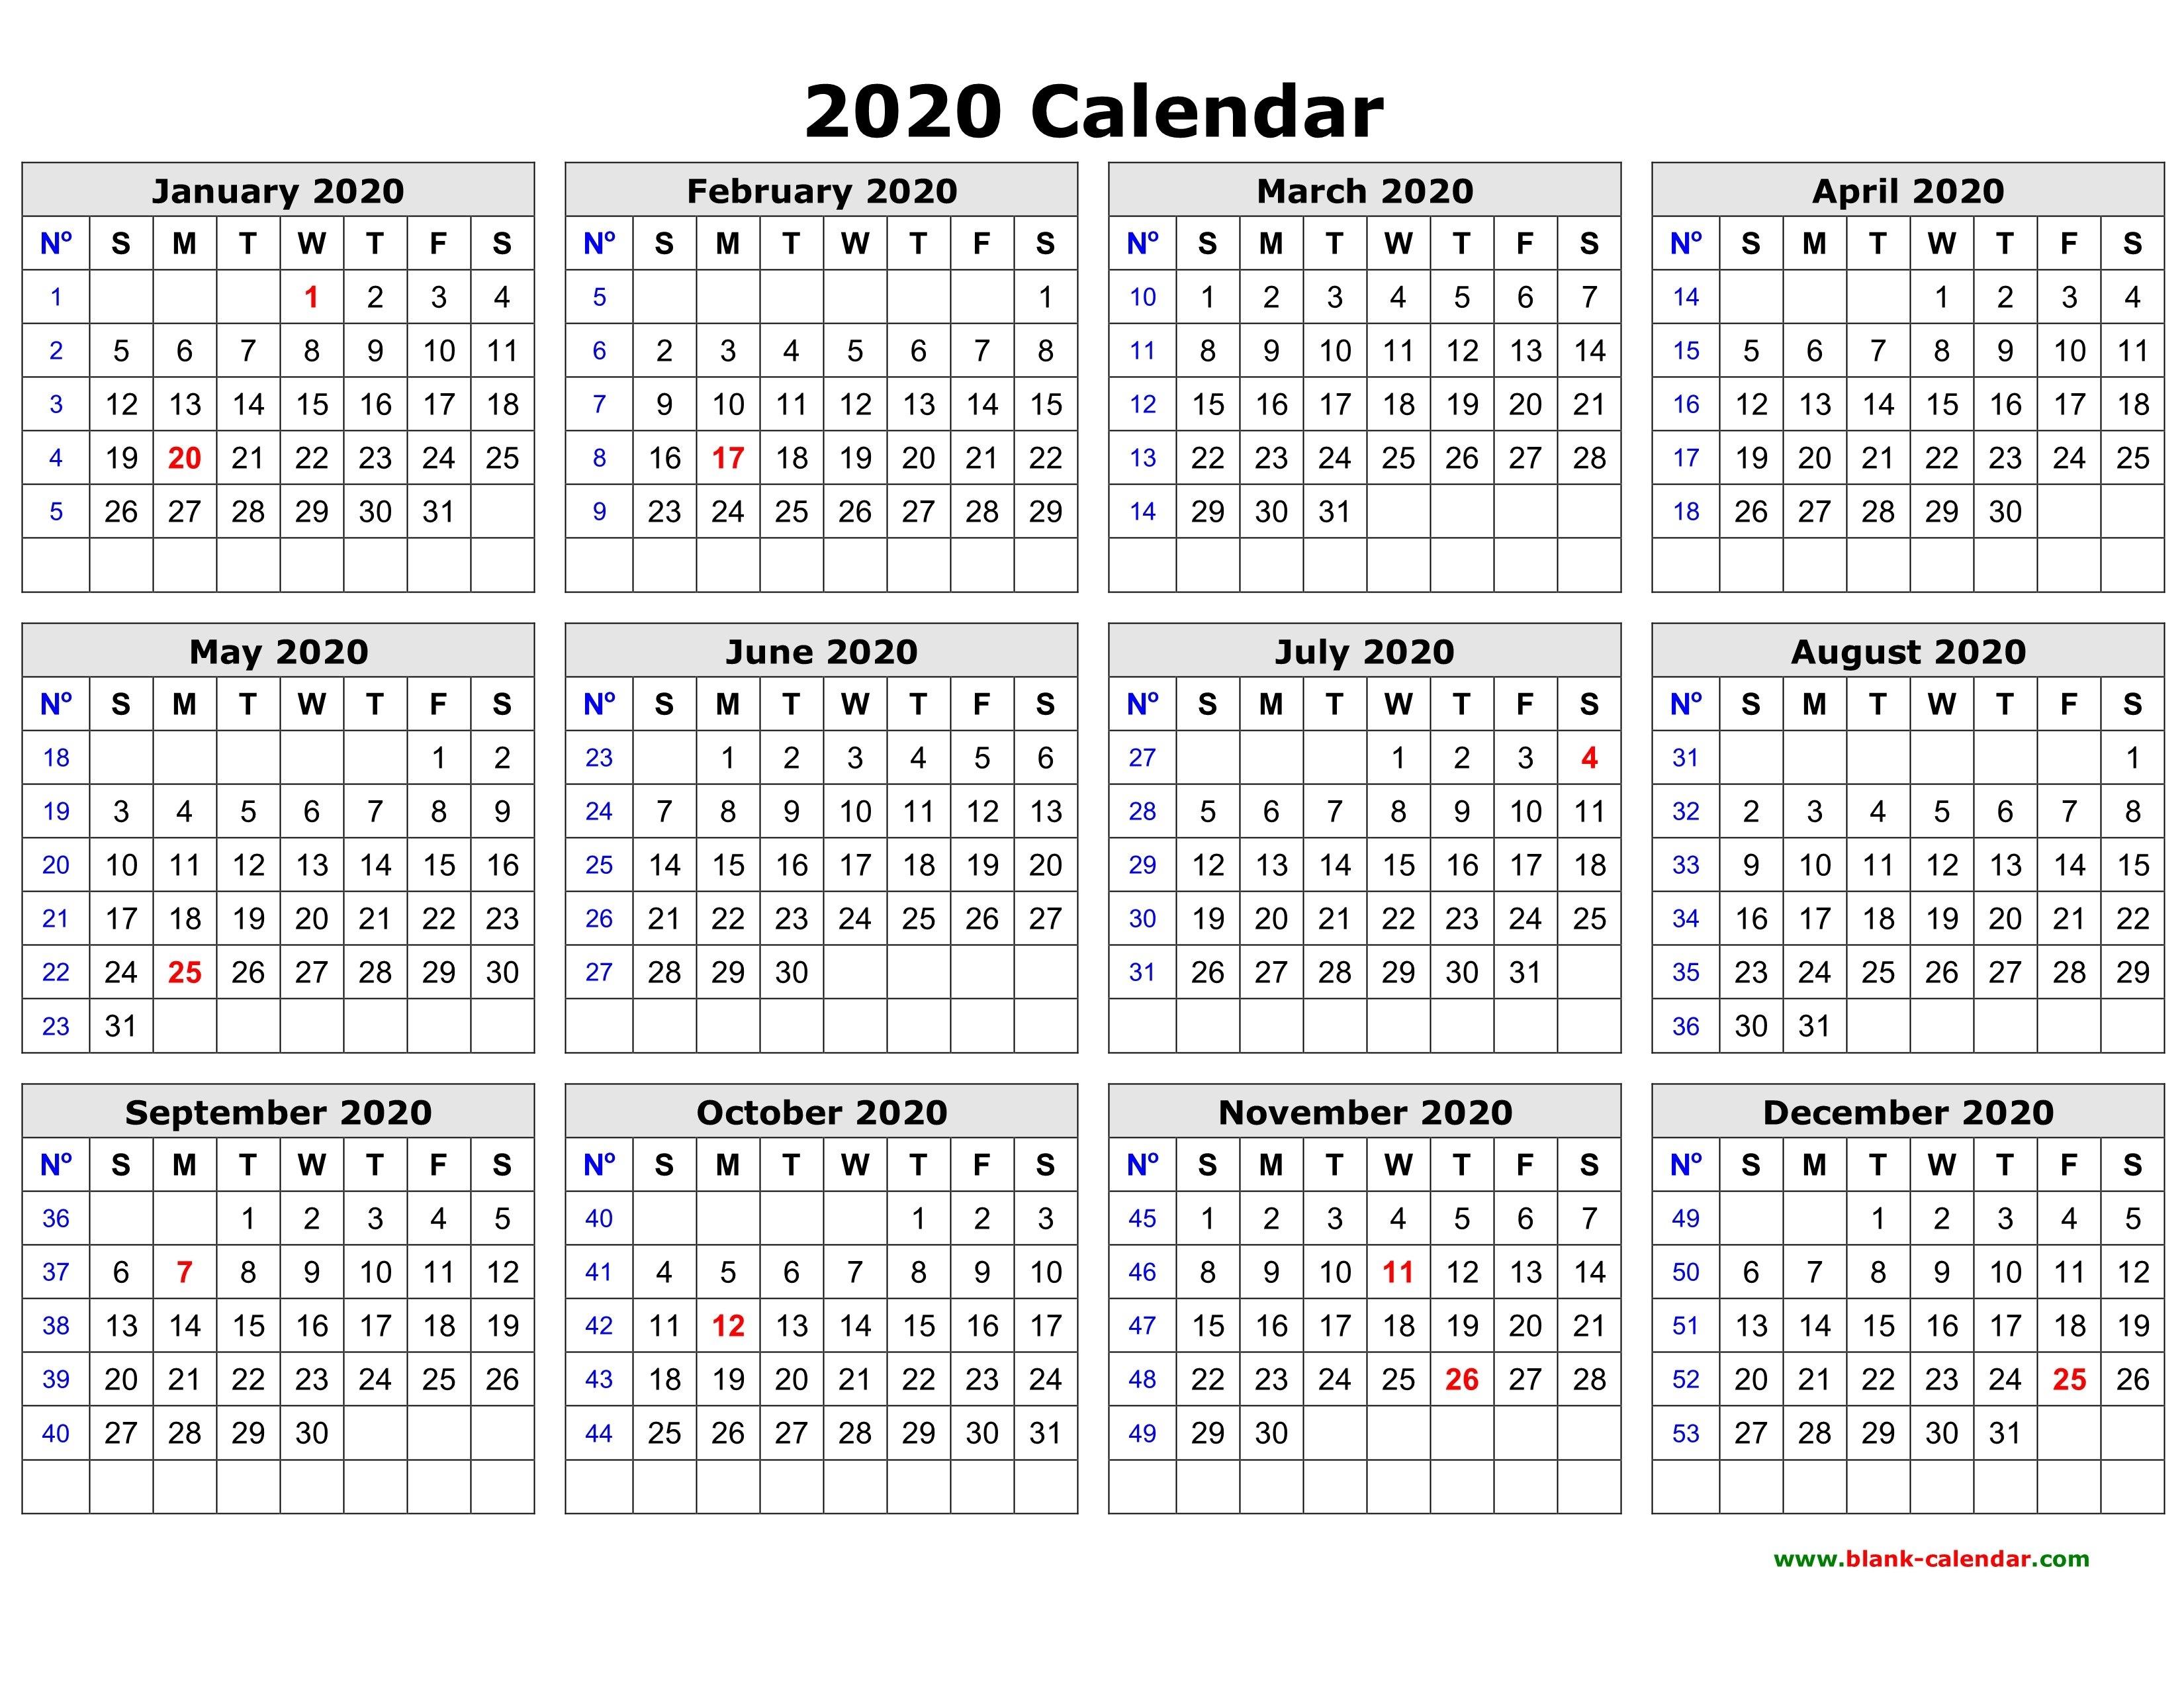 Free Download Printable Calendar 2020 In One Page, Clean Design. 2019 Calendar 2020 Printable